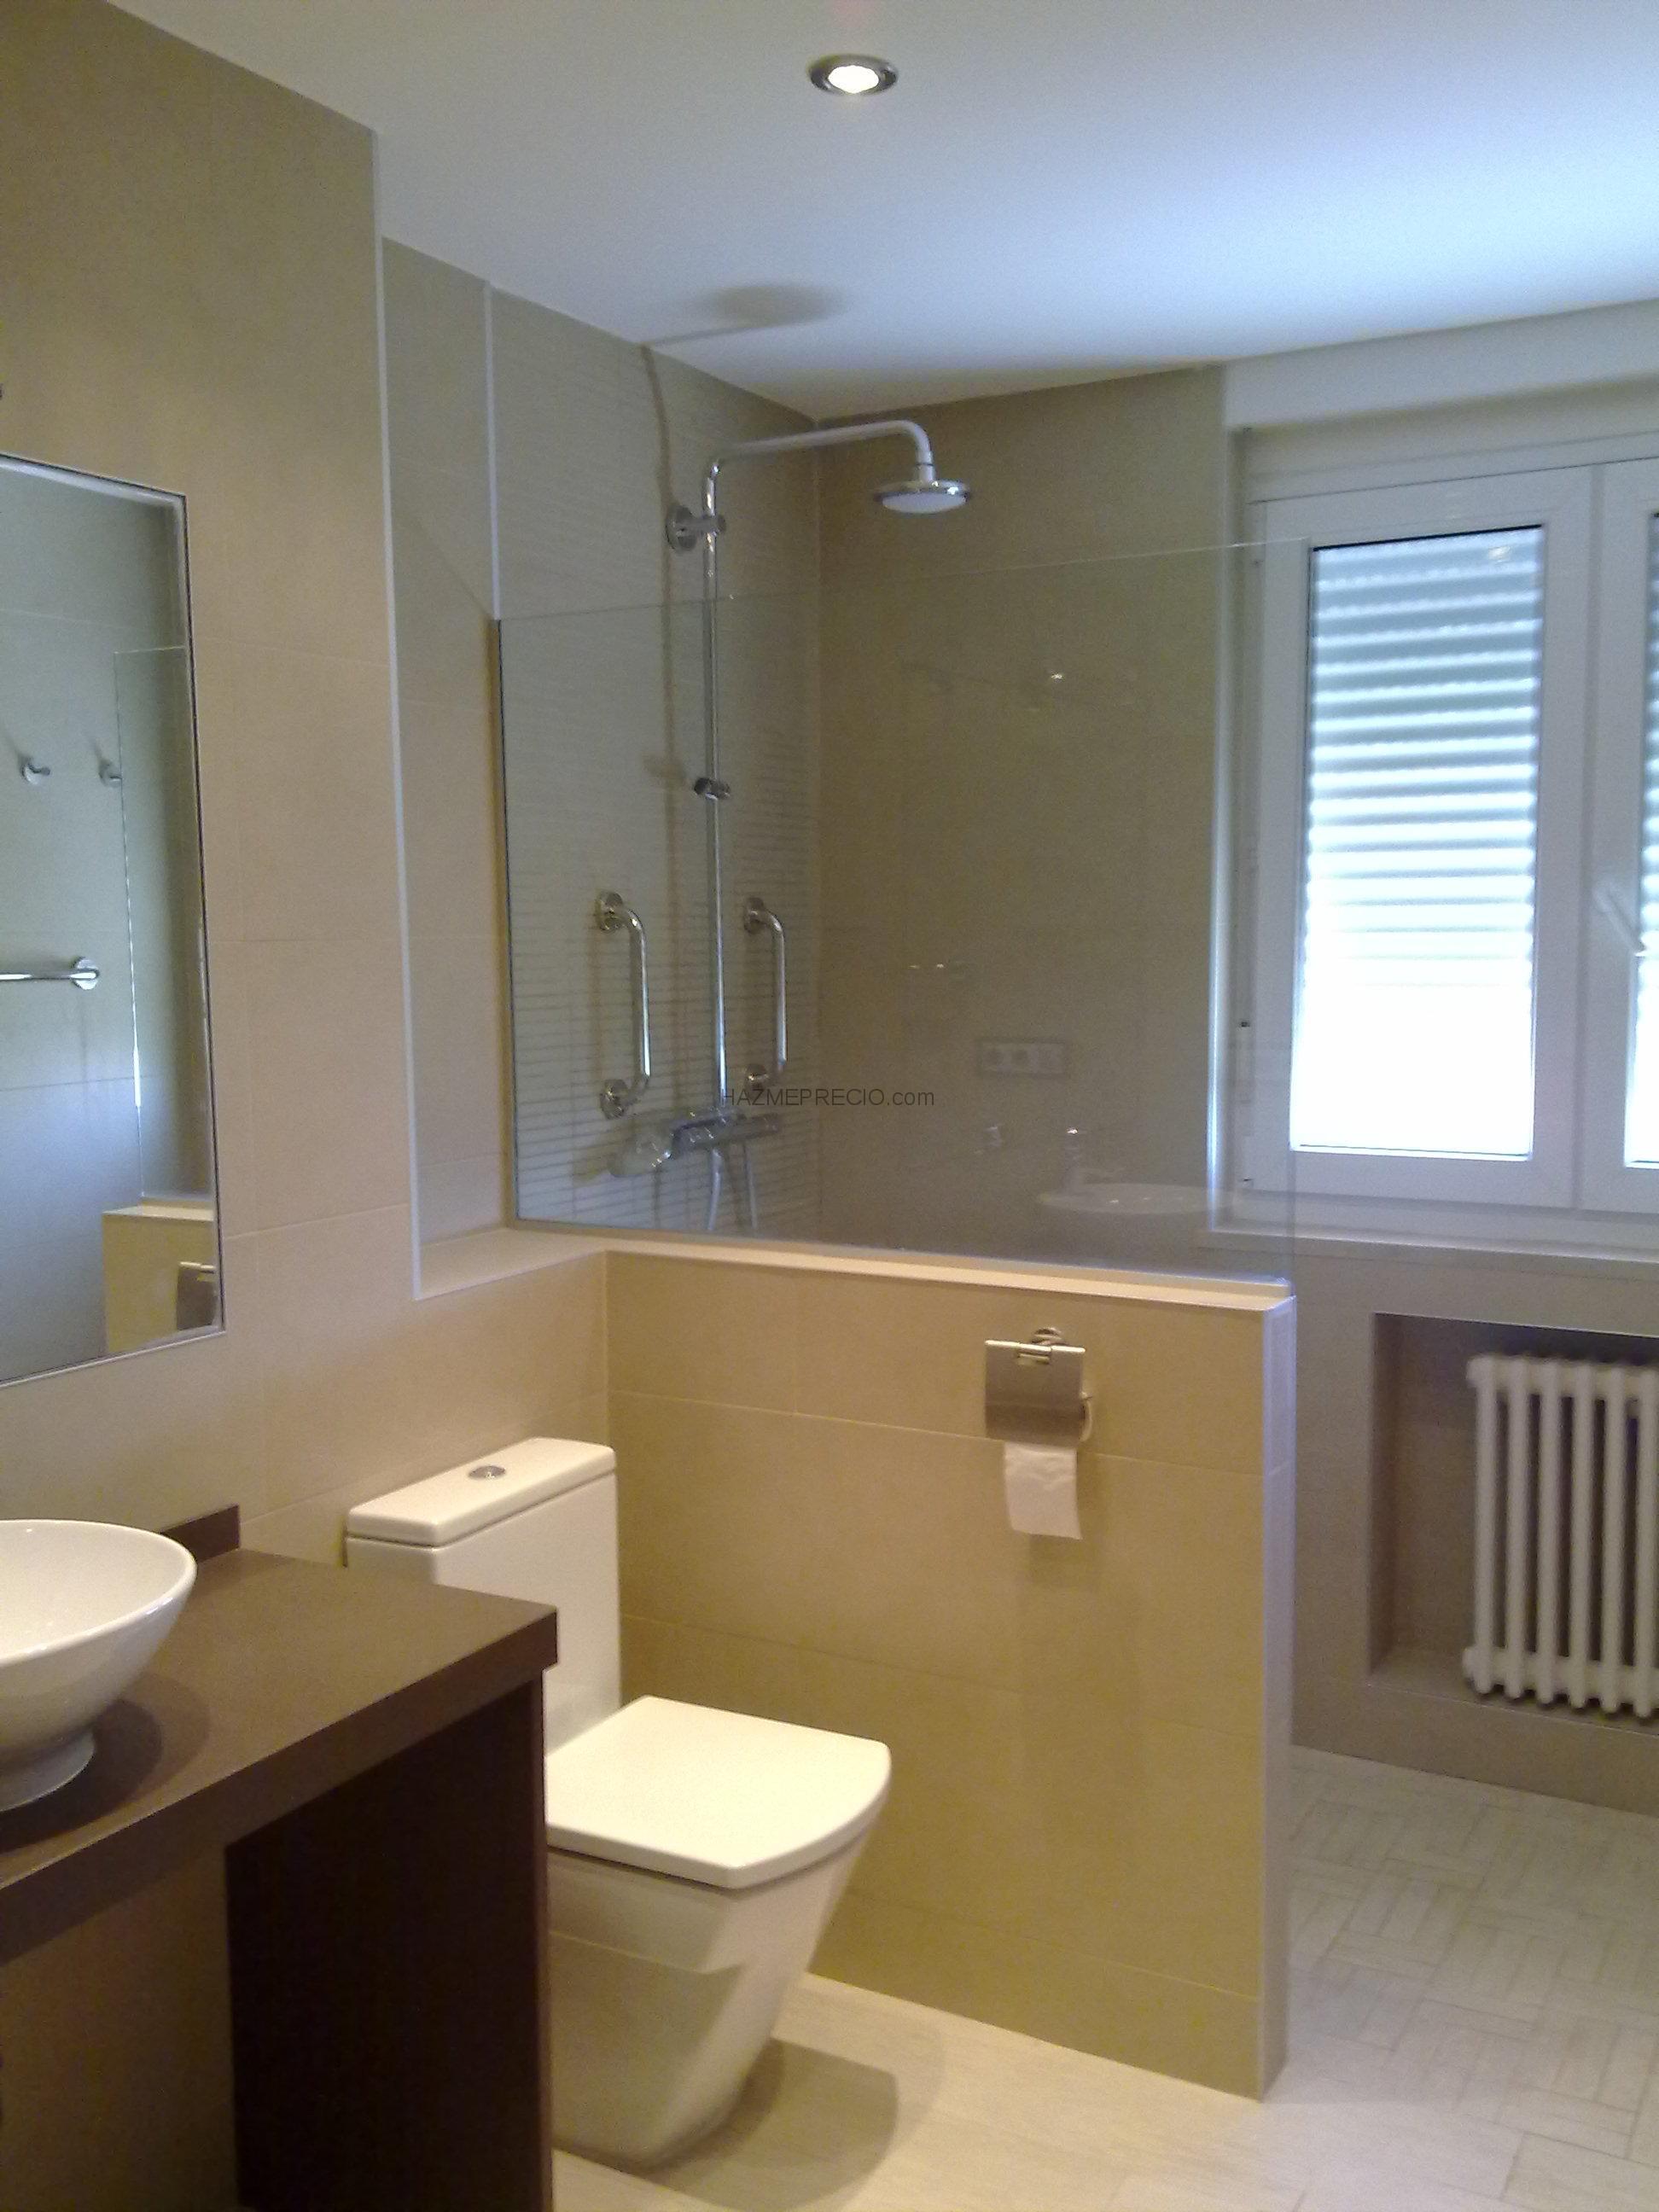 Baños Modernos Marmol:Bano moderno imitacion marmol